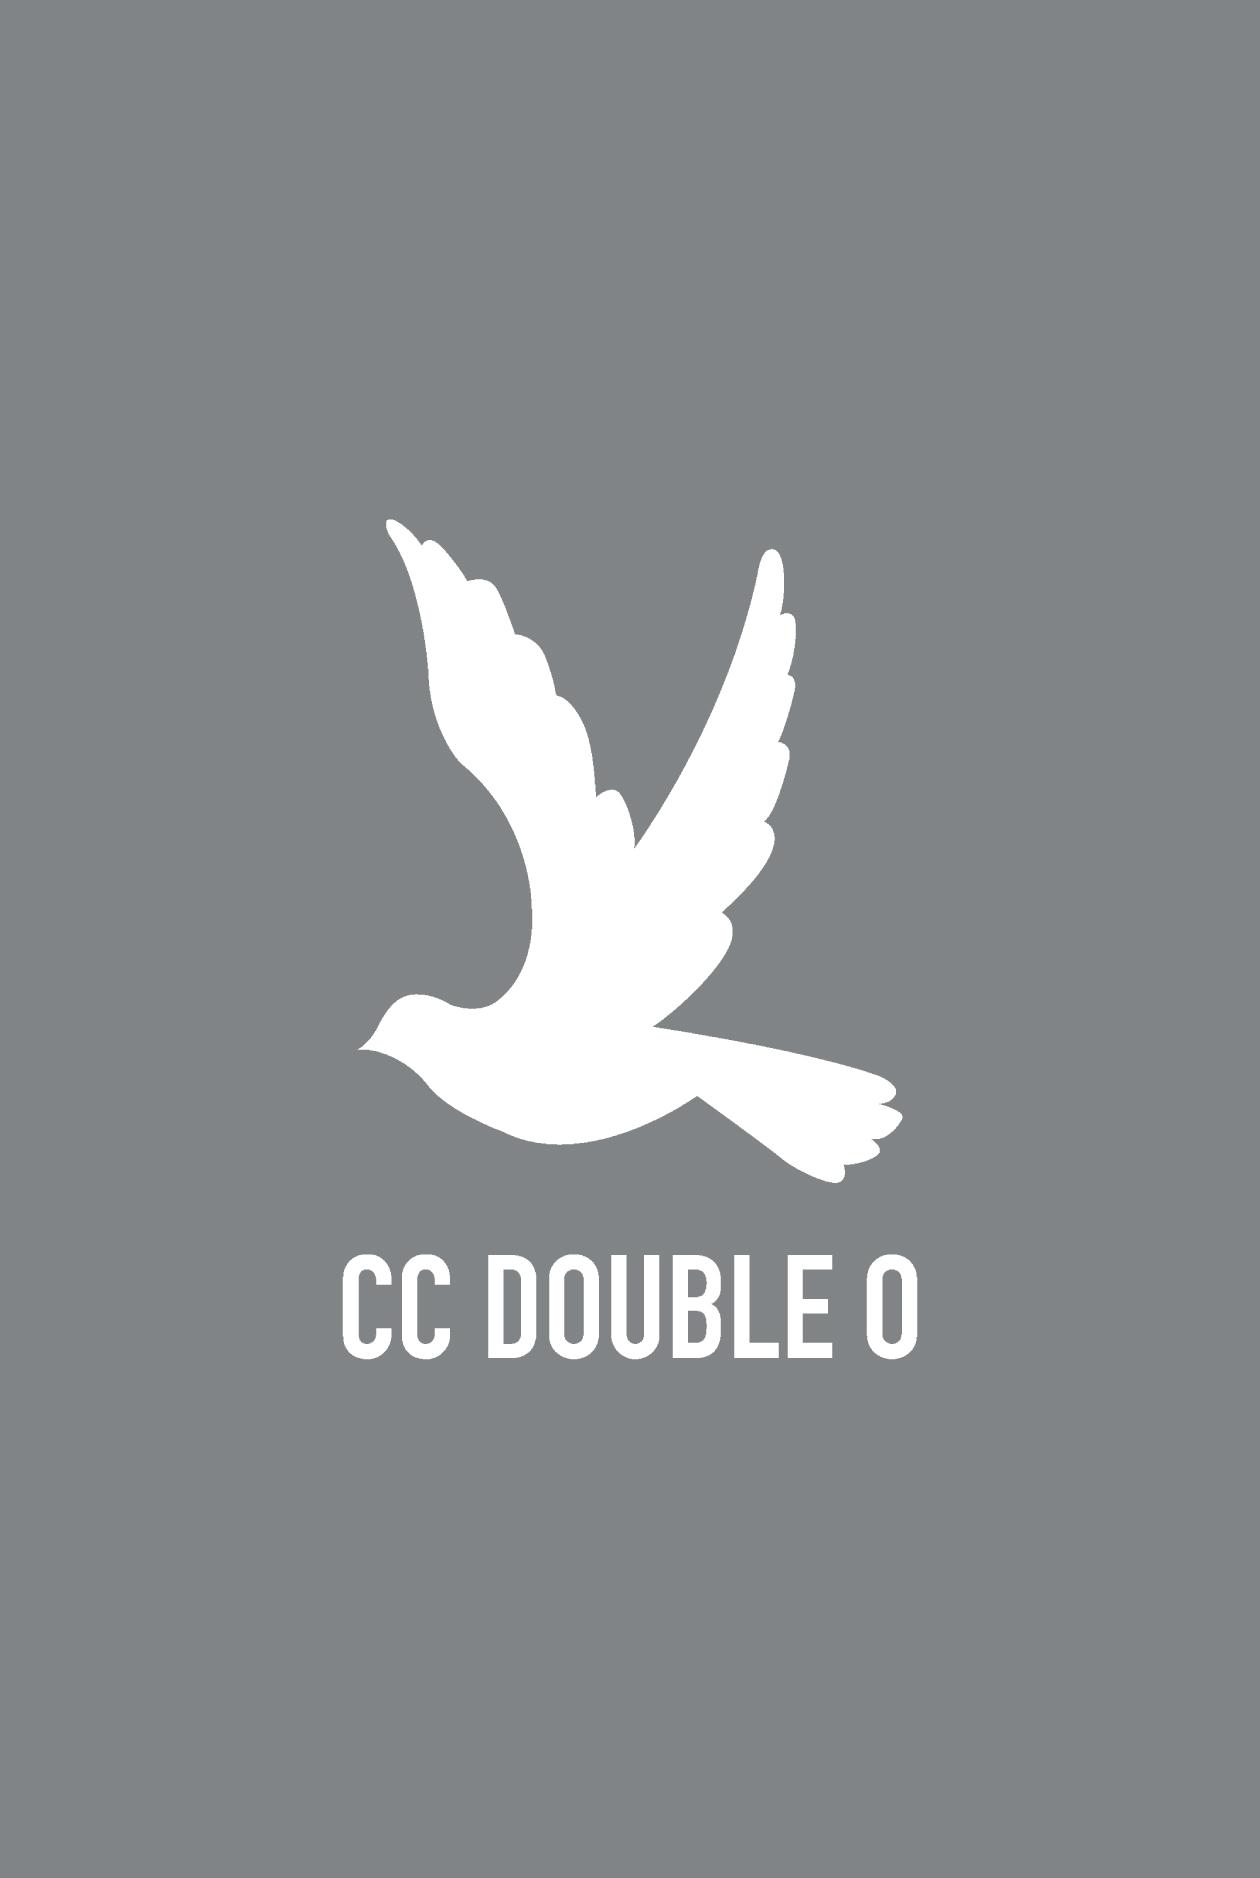 Bird Logo Long-Sleeved Polo with CC DOUBLE O Badge Detail